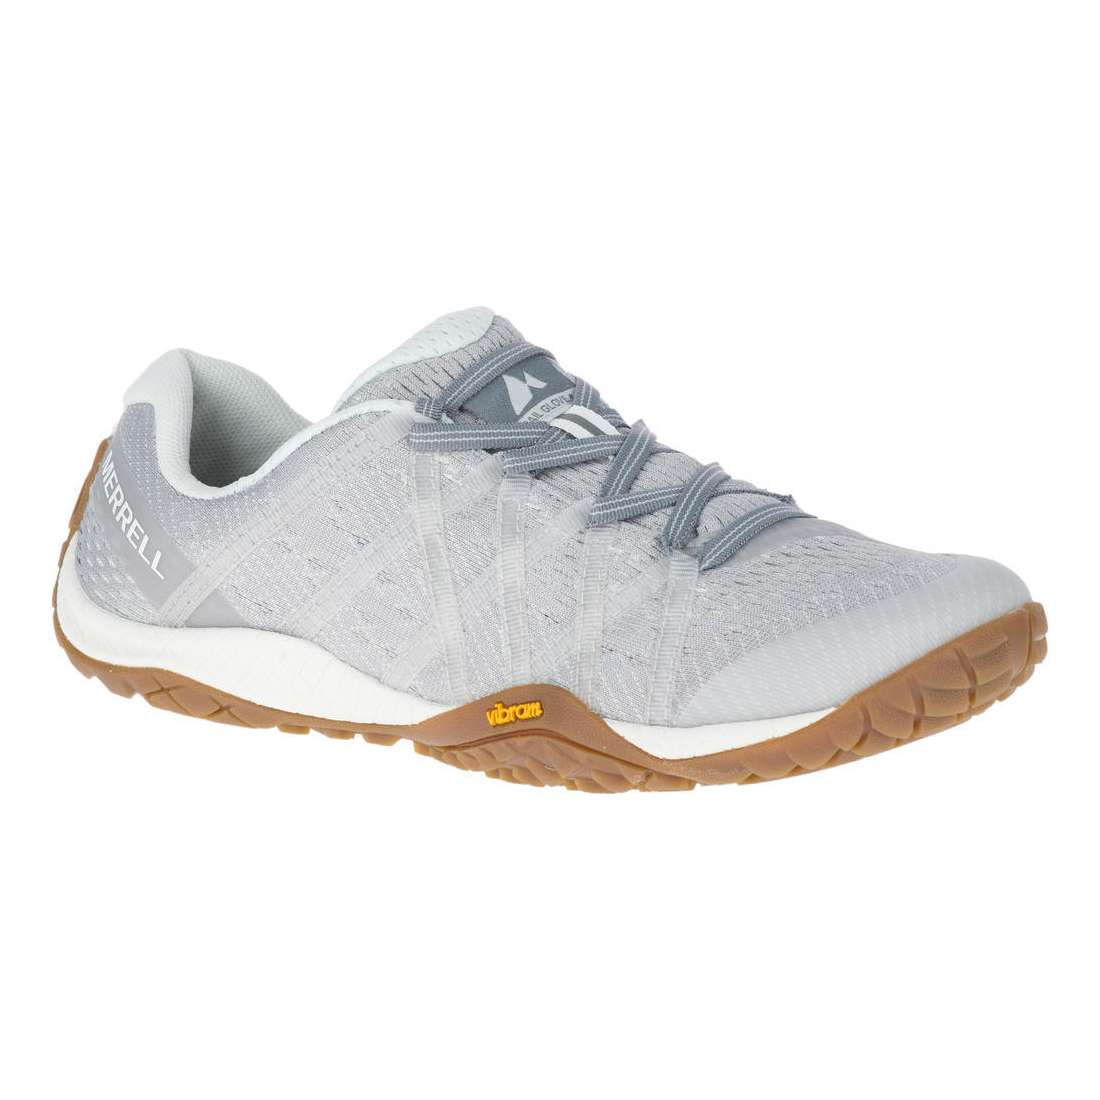 designer fashion quality design popular brand Merrell Trail Glove 4 E-Mesh Women| shoes minimalist trail